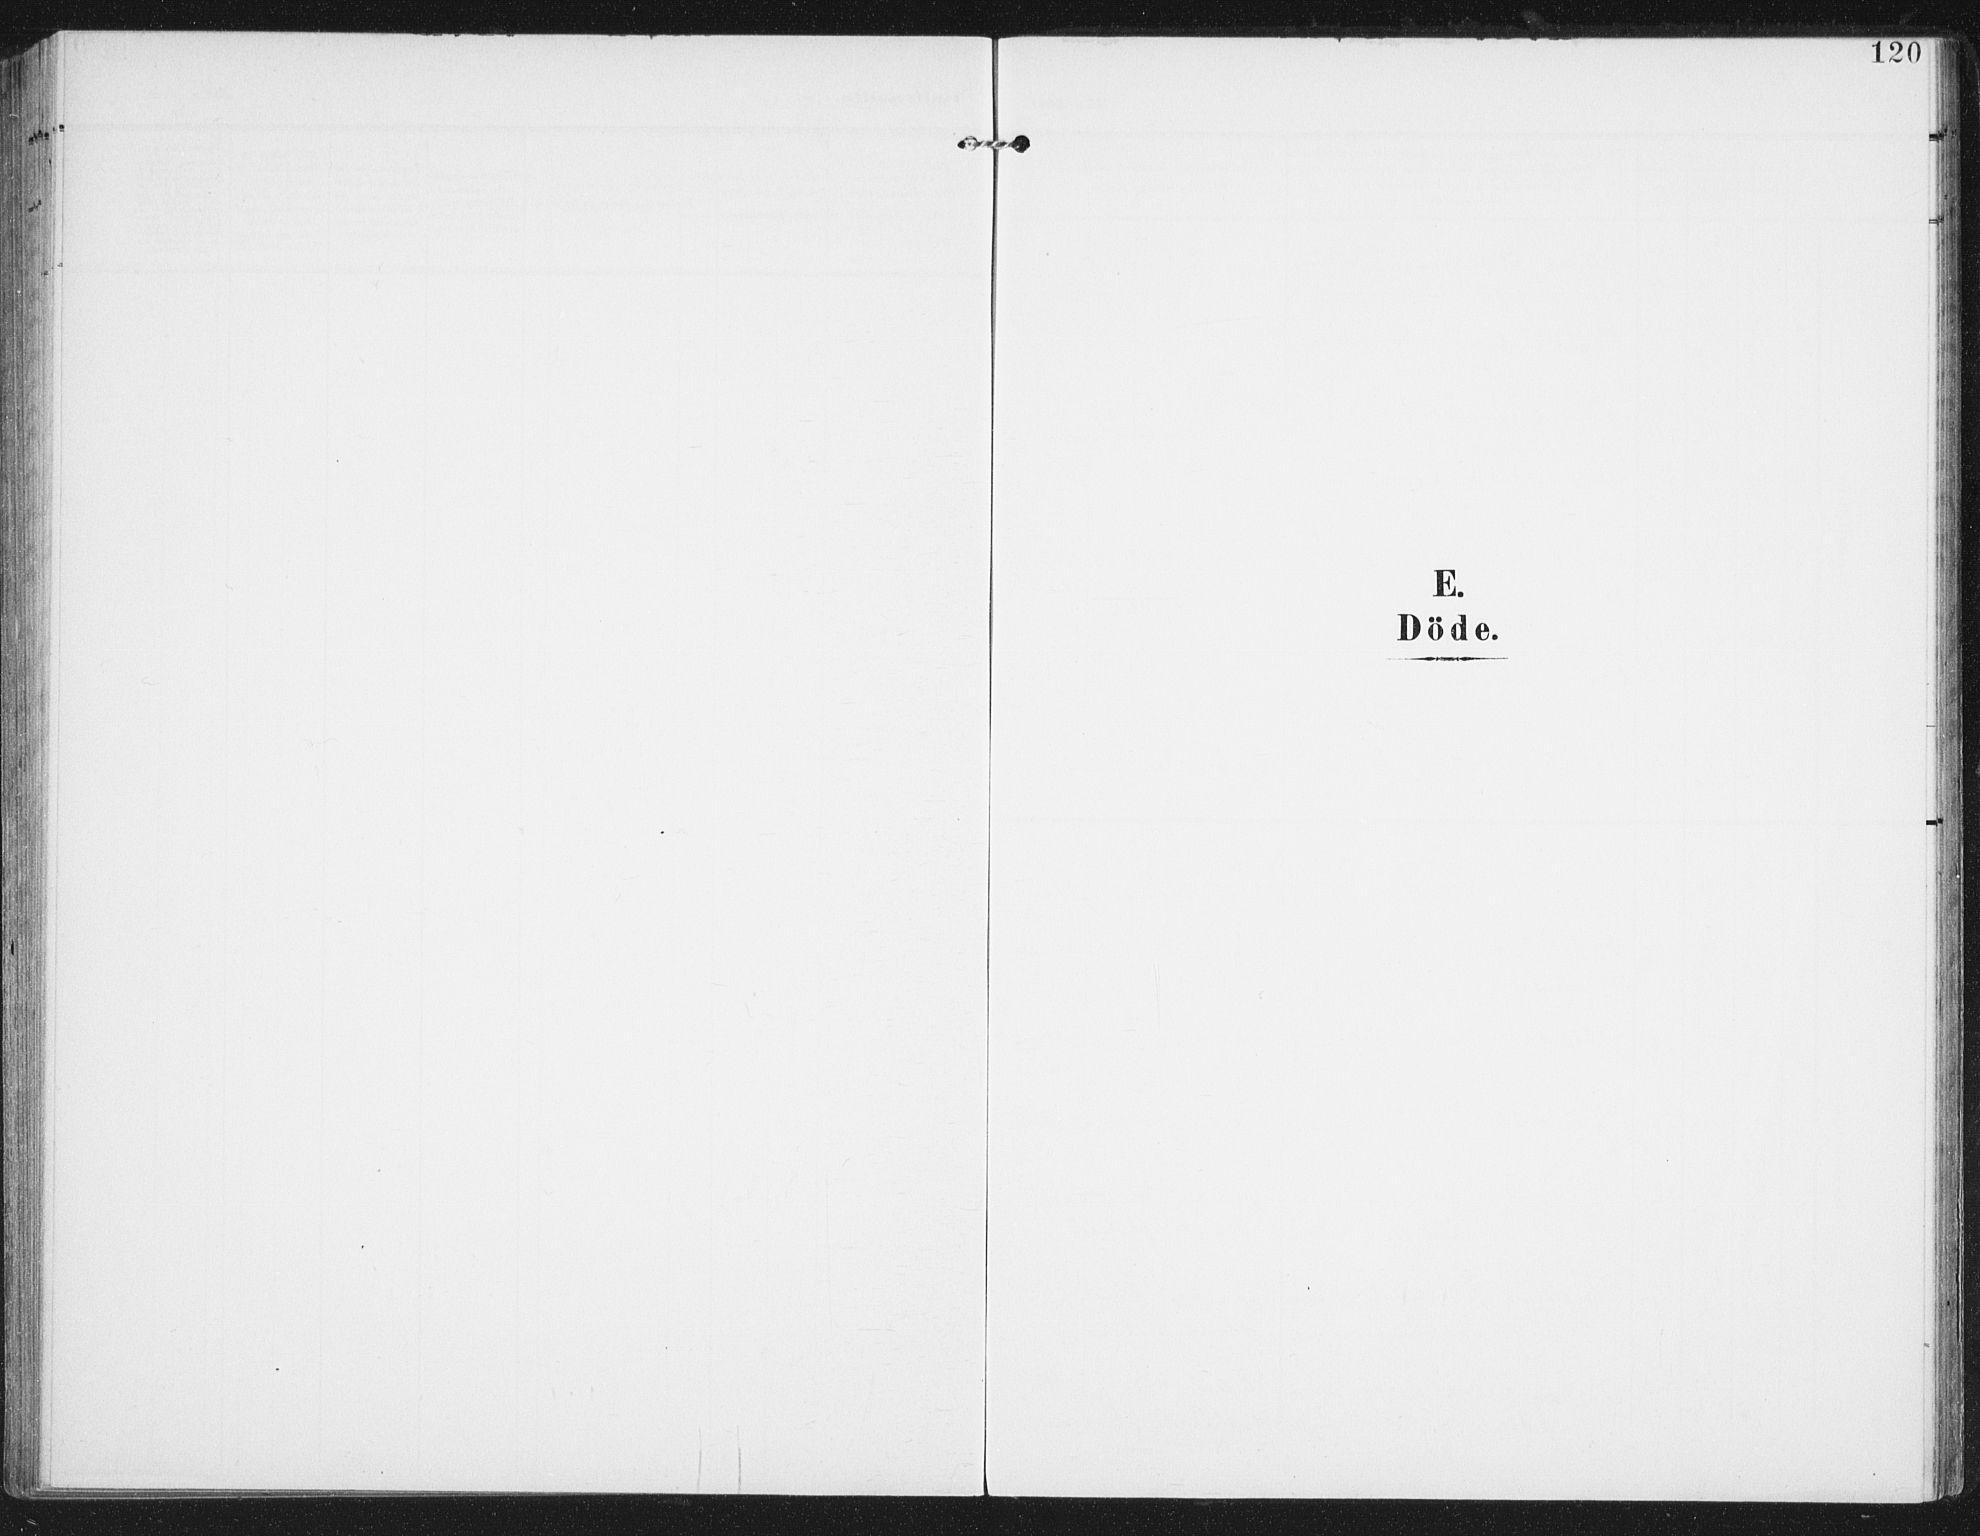 SAT, Ministerialprotokoller, klokkerbøker og fødselsregistre - Nordland, 886/L1221: Ministerialbok nr. 886A03, 1903-1913, s. 120